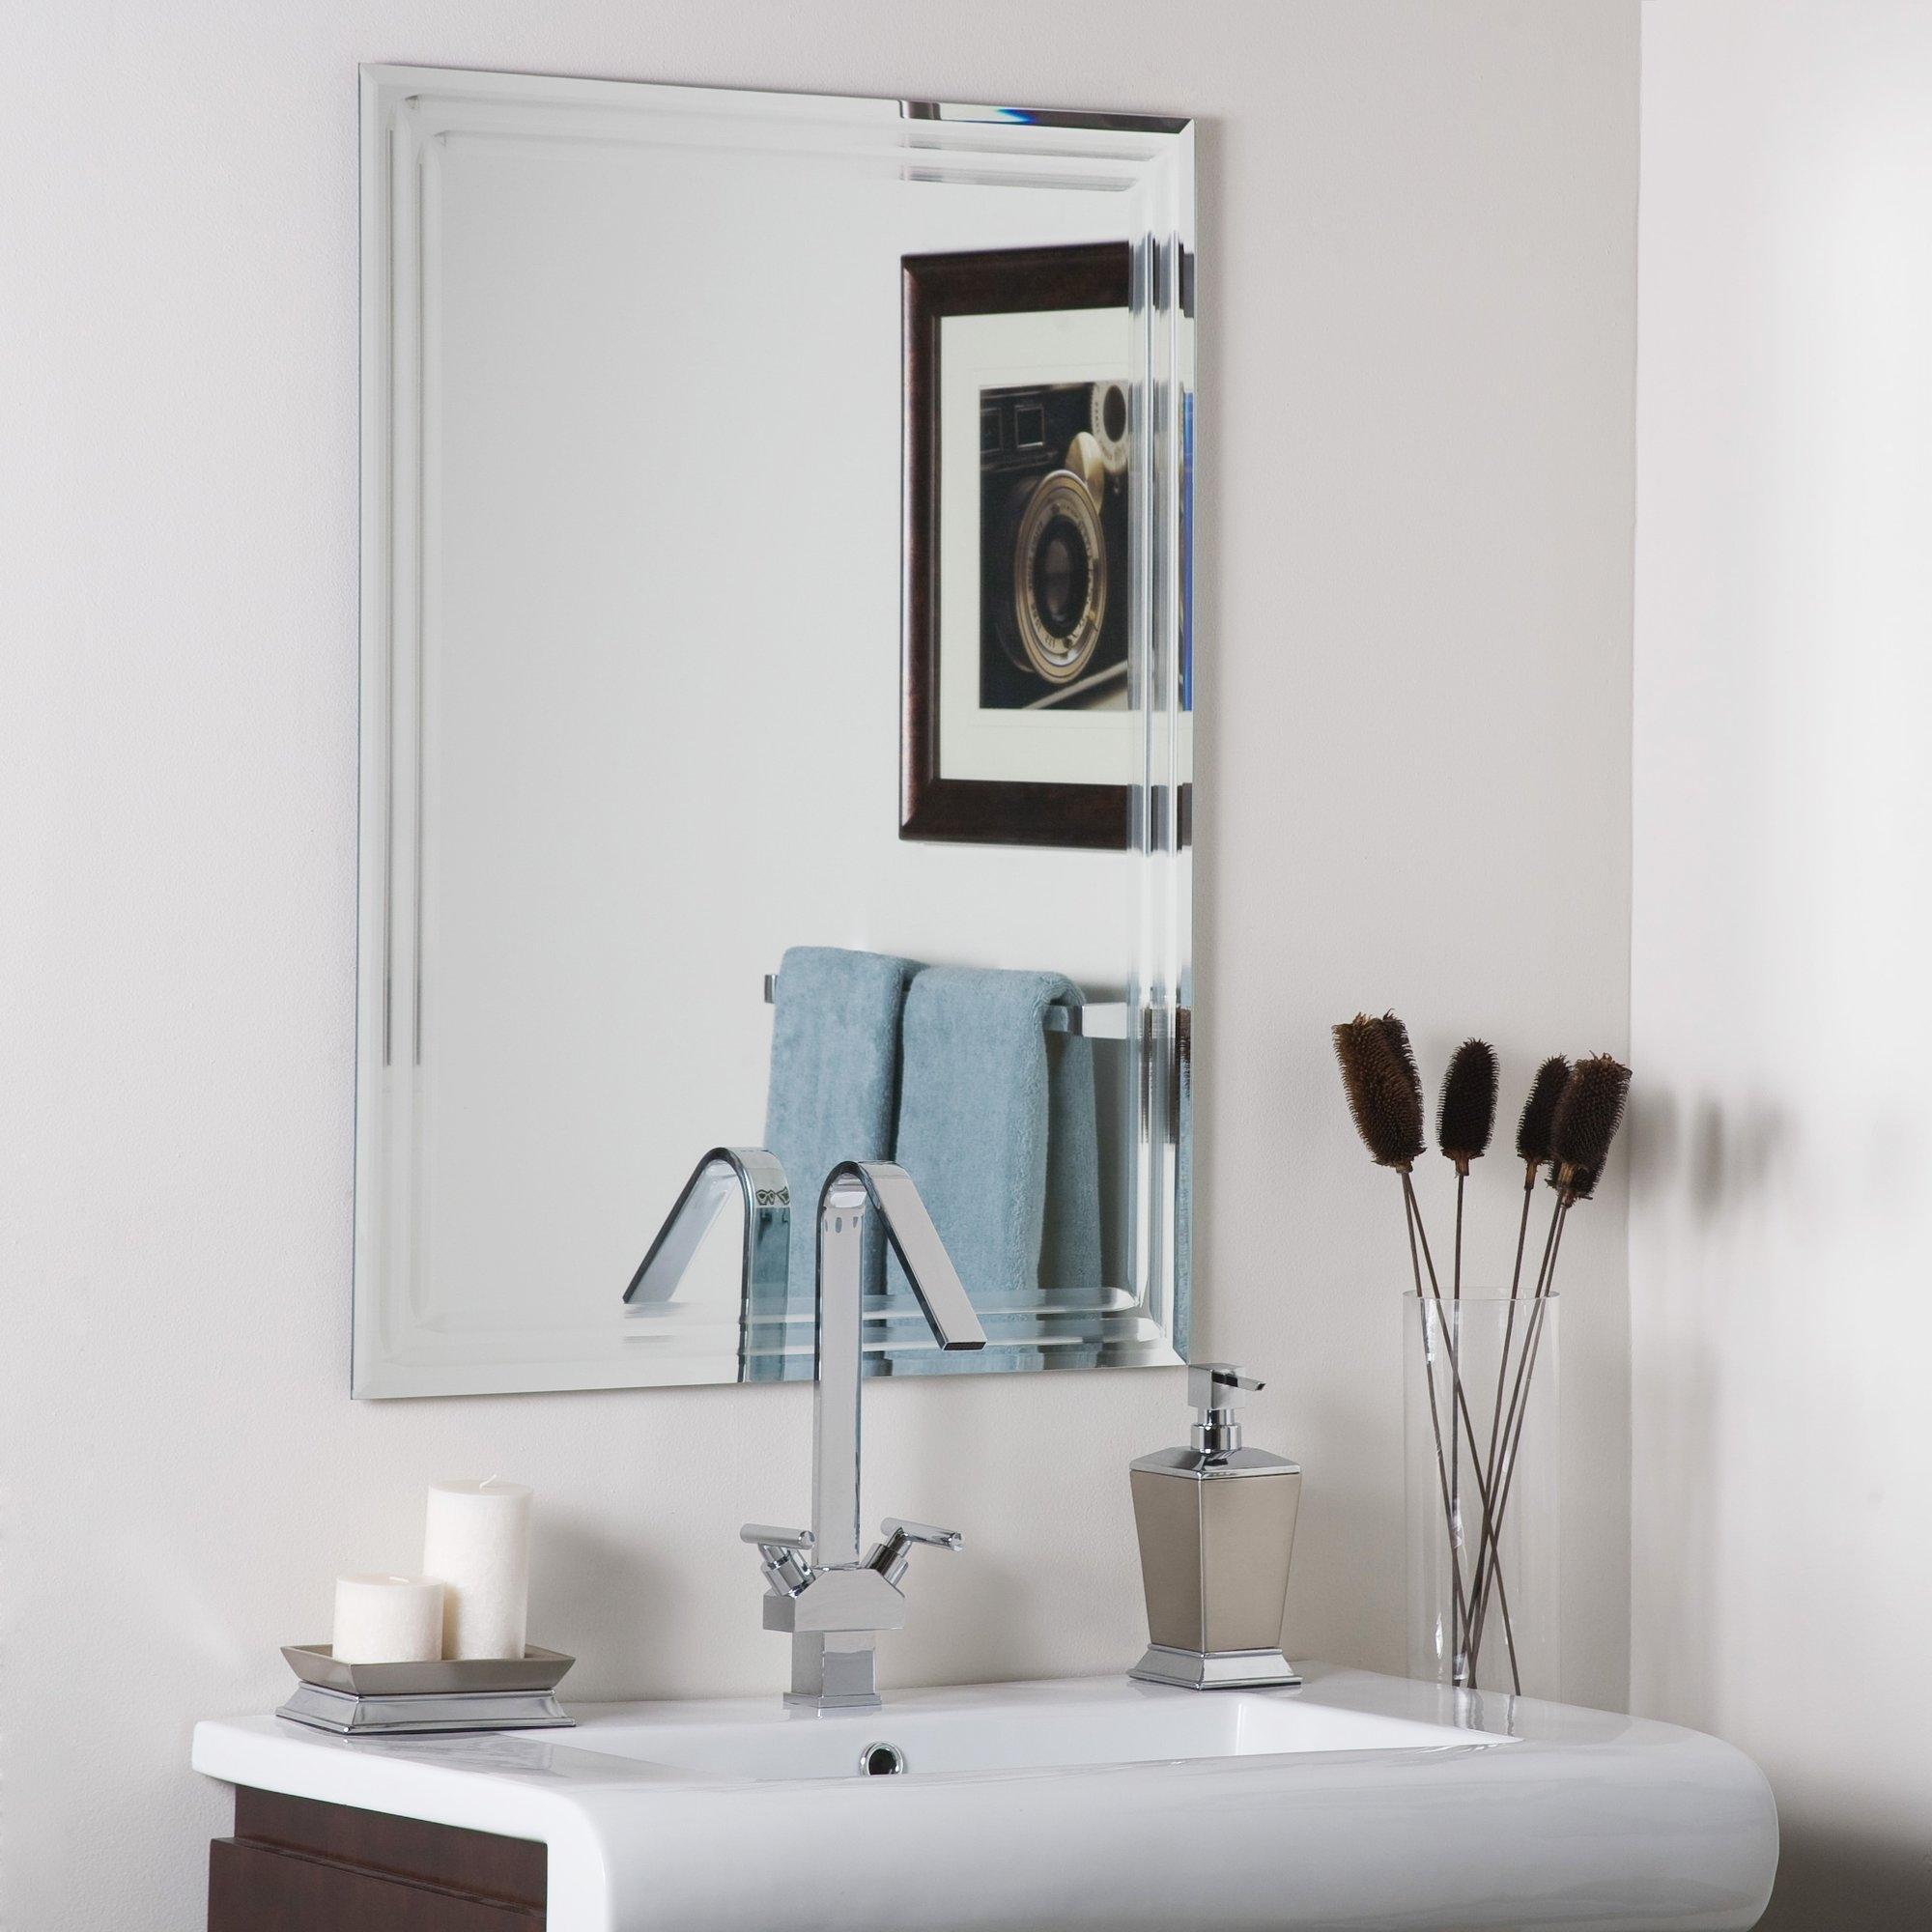 Brayden Studio Frameless Tri Bevel Wall Mirror Reviews Wayfair Inside Bevel Mirror (Image 5 of 15)